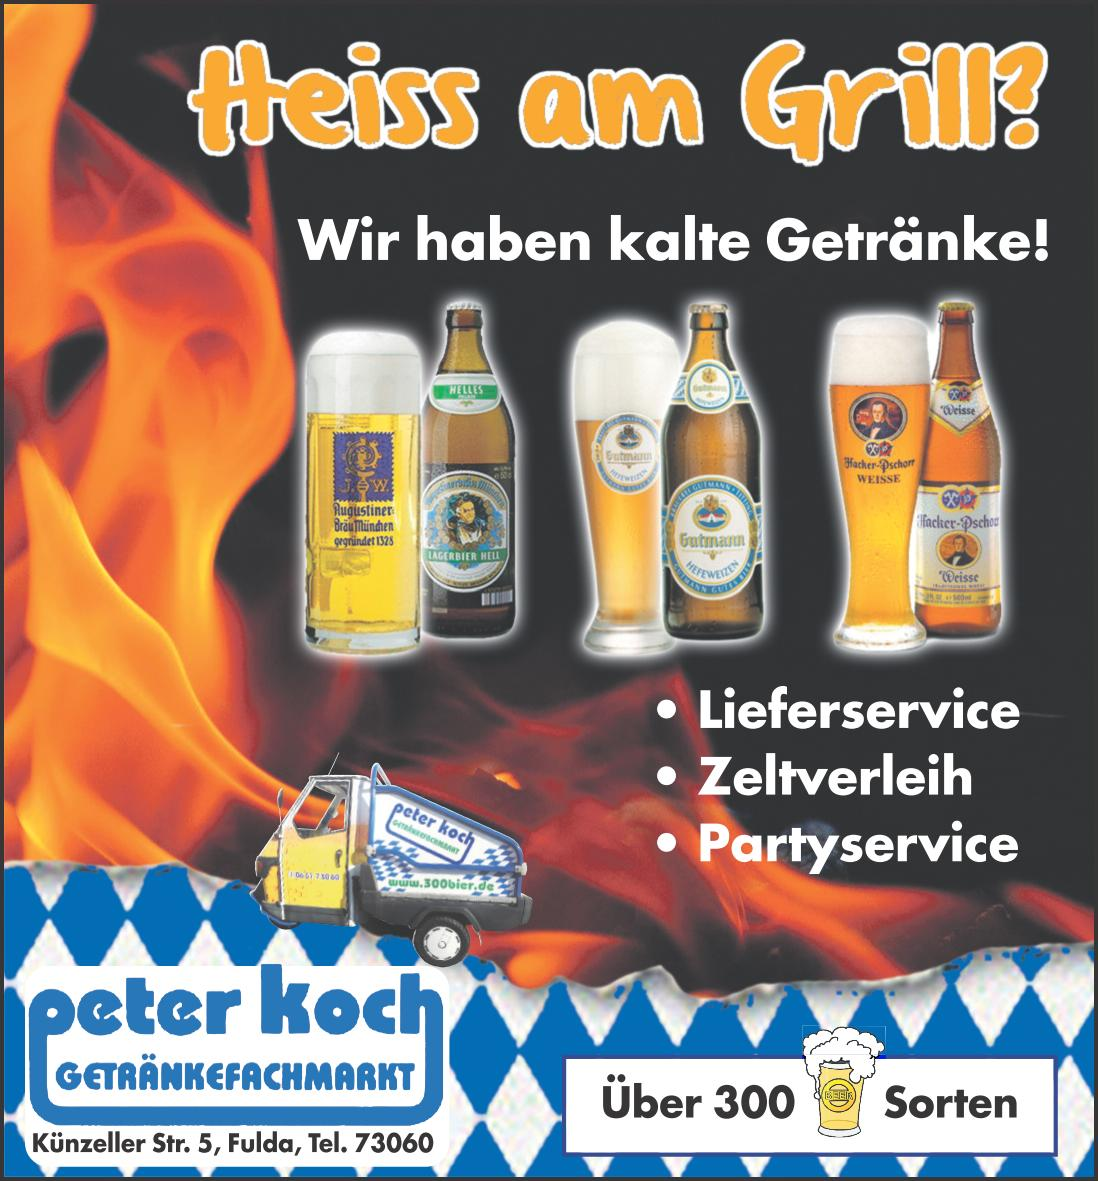 Deutsche grill bbq meisterschaft fulda peter koch for Koch 300 biersorten fulda